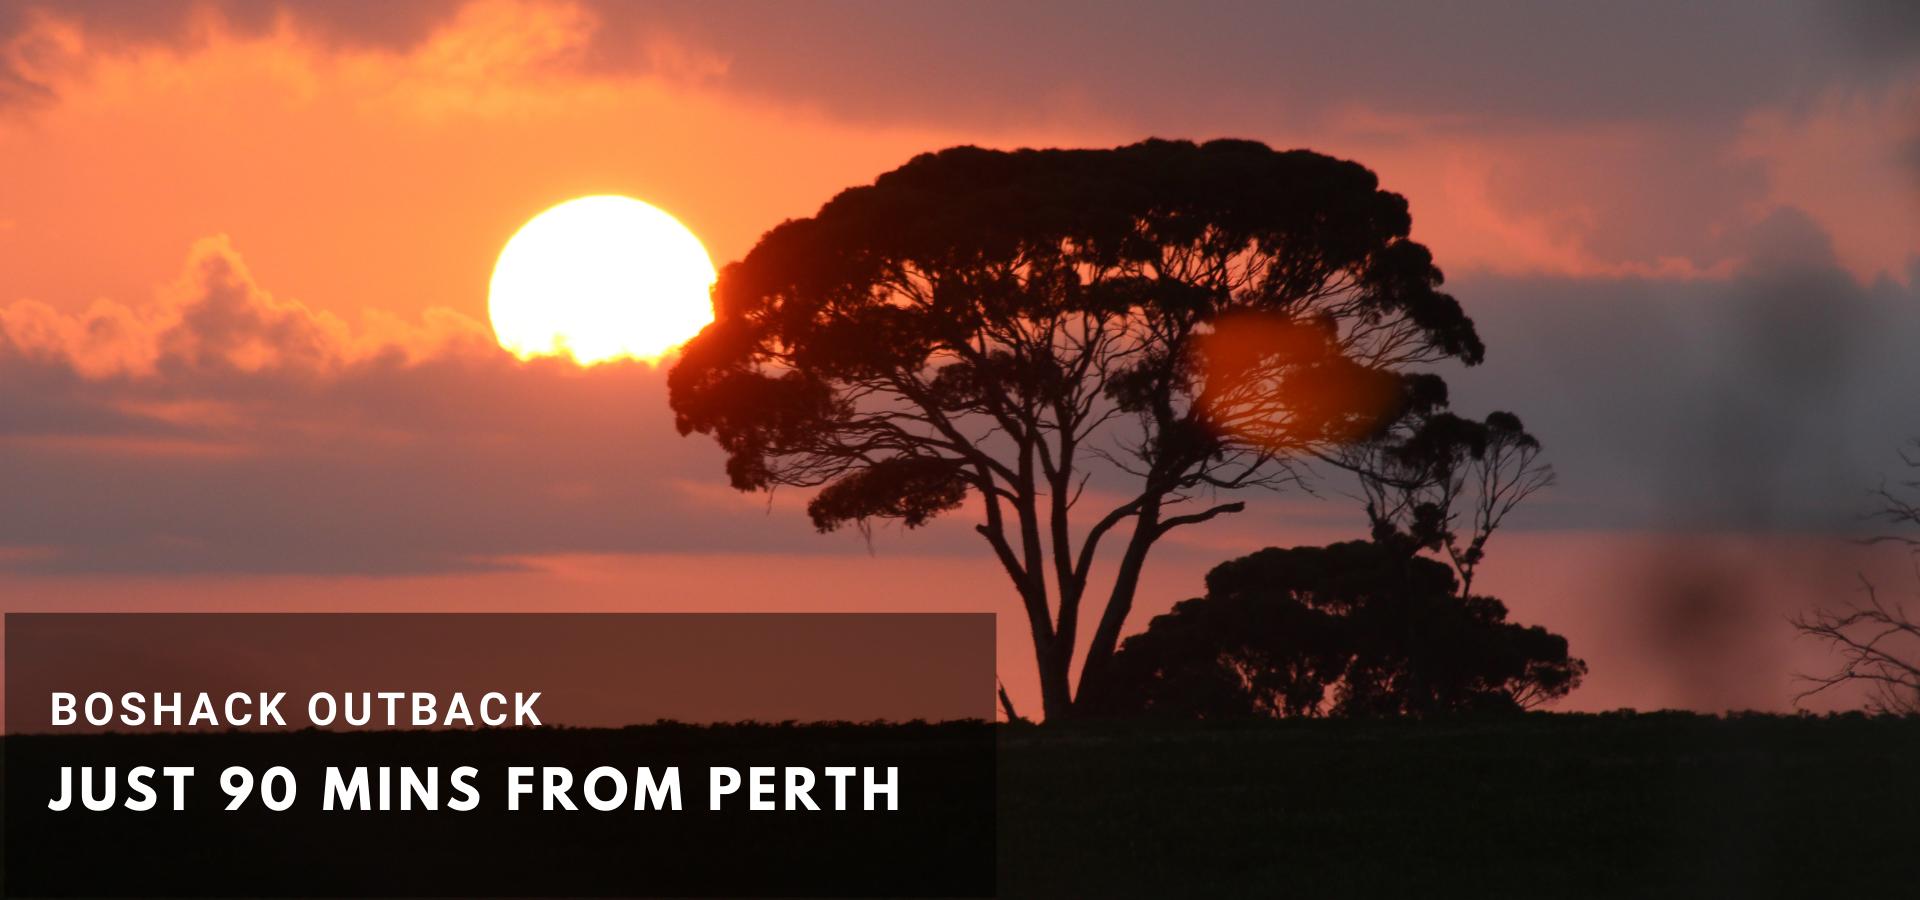 Extraordinary experiences at Boshack Outback